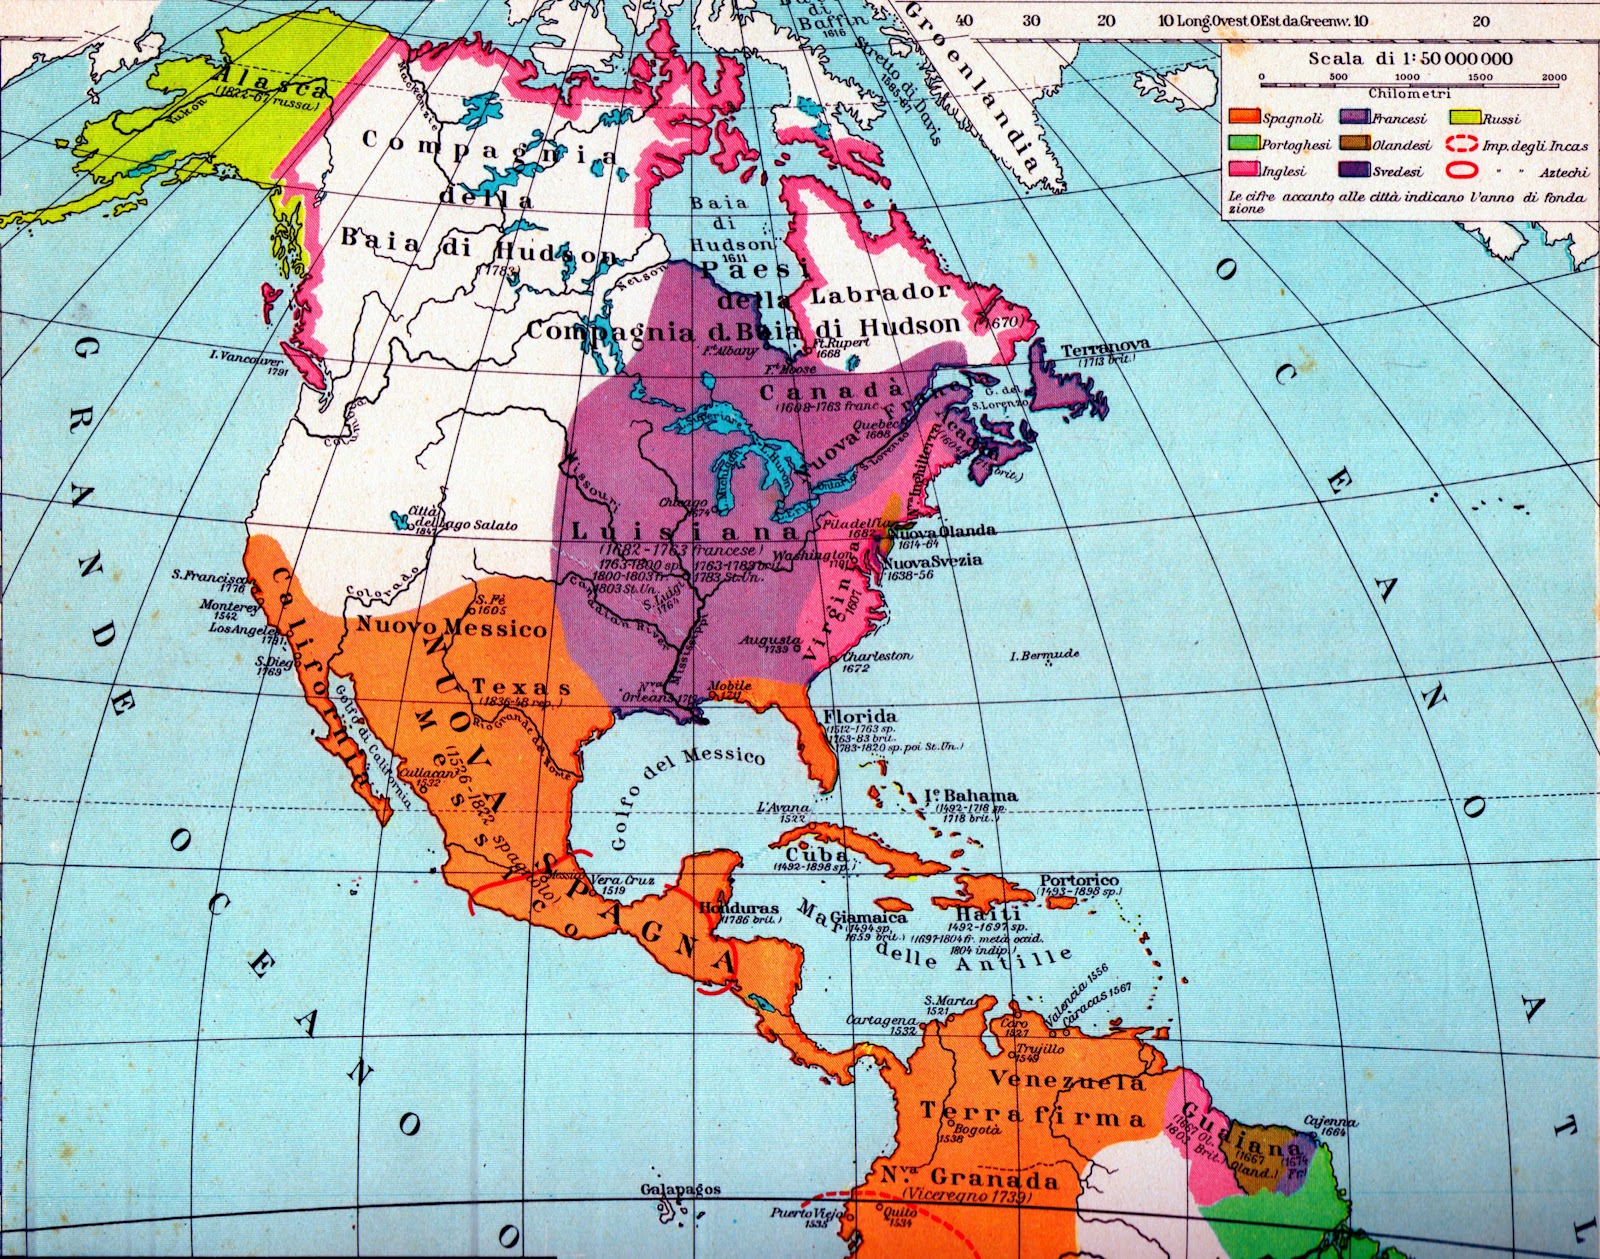 Cartina Muta Del Mondo Completamente Bianca Pieterduisenberg